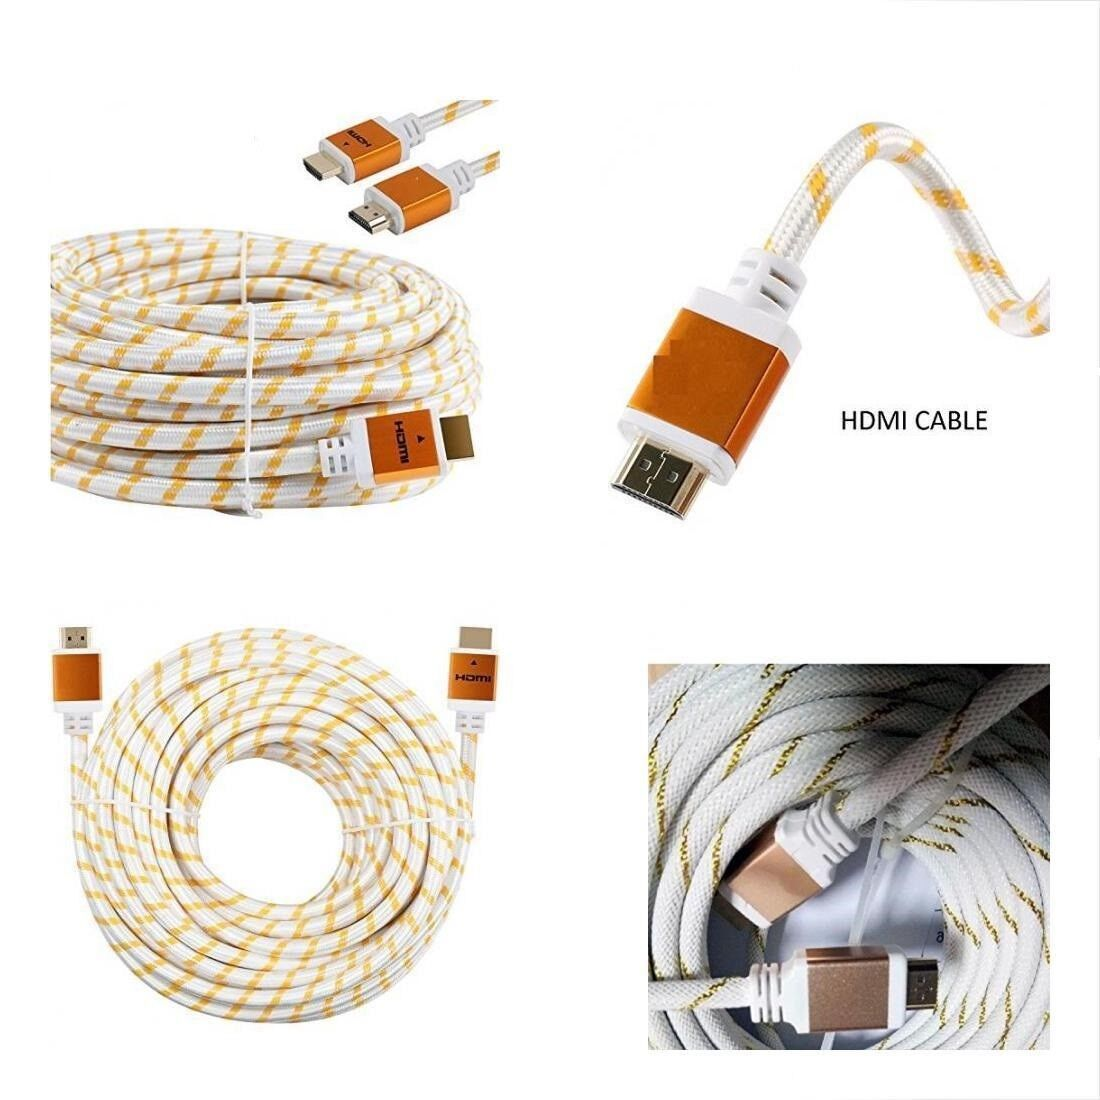 Premium HDMI Cable Cord 3ft 6ft 10ft 15ft 25ft 30ft 50ft 75ft 100ft White LOT US Consumer Electronics